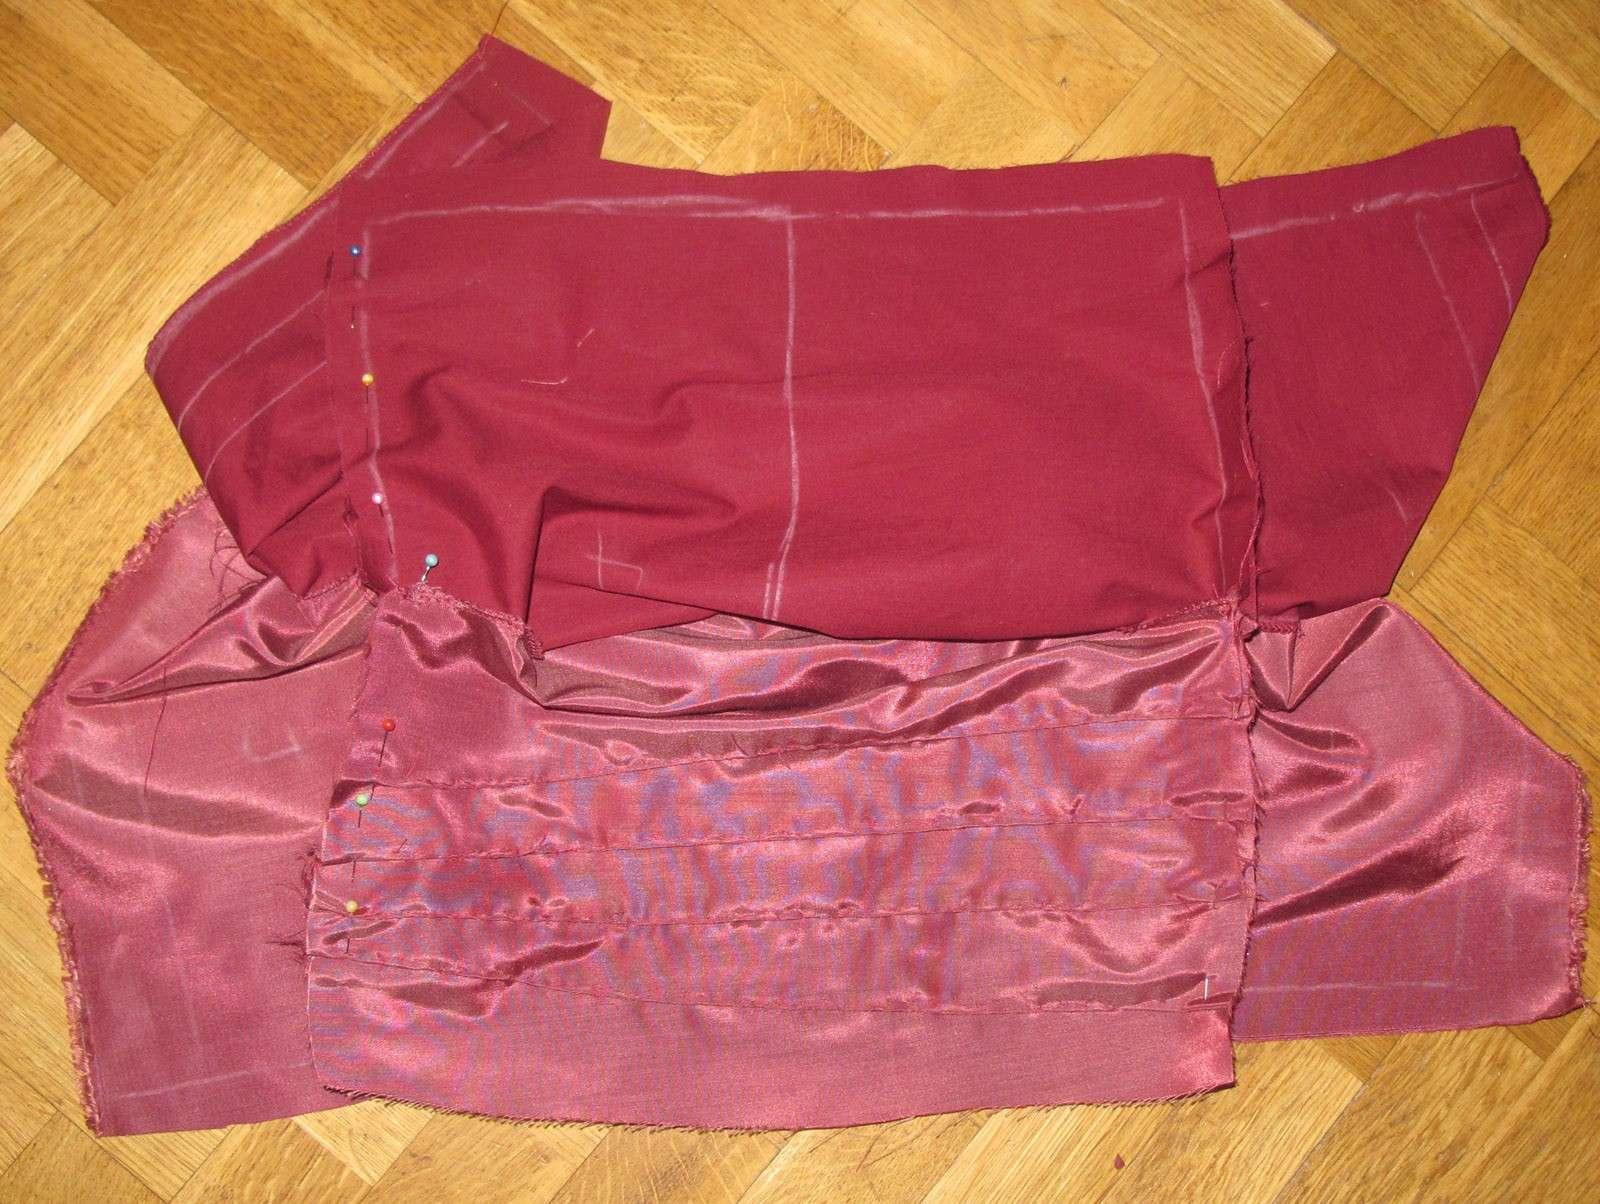 http://i41.servimg.com/u/f41/09/01/63/29/robe-t24.jpg